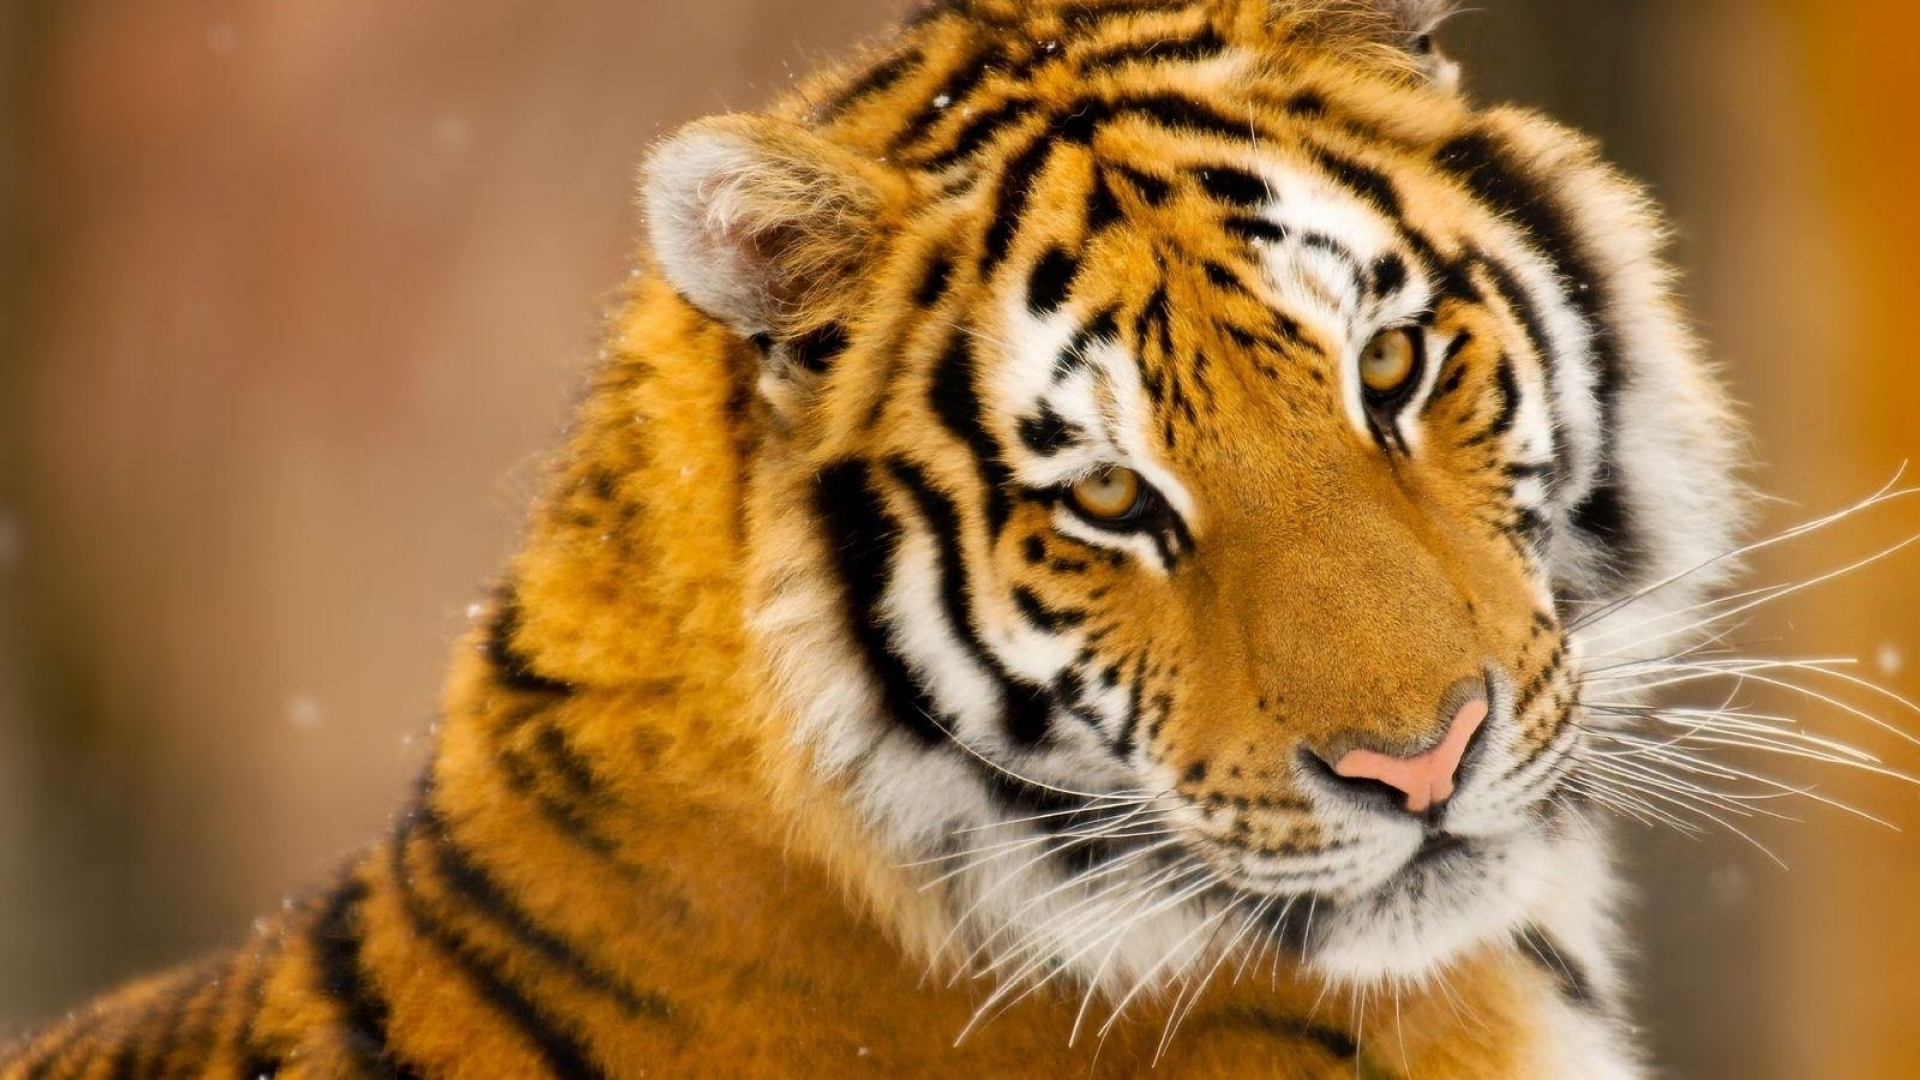 морда тигра, тигр, скачать фото, обои на рабочий стол